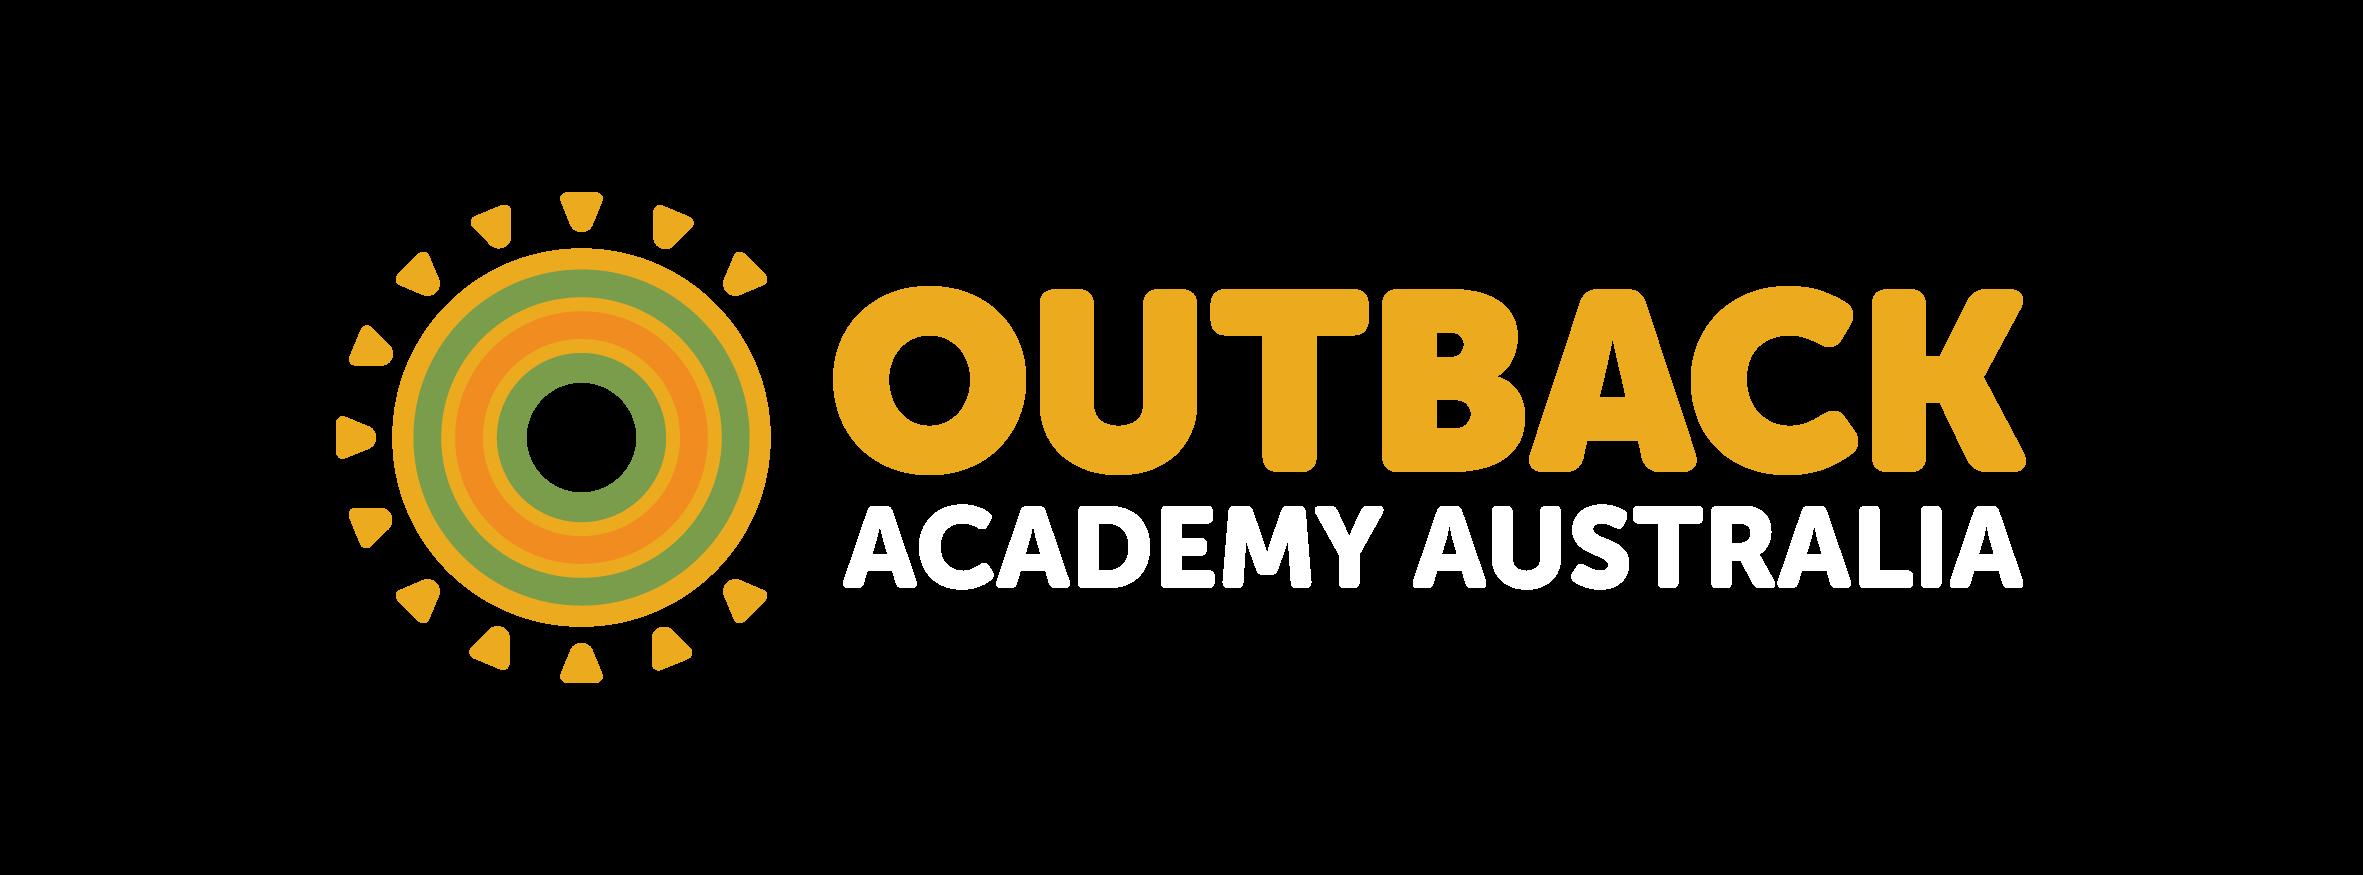 Outback Academy Australia